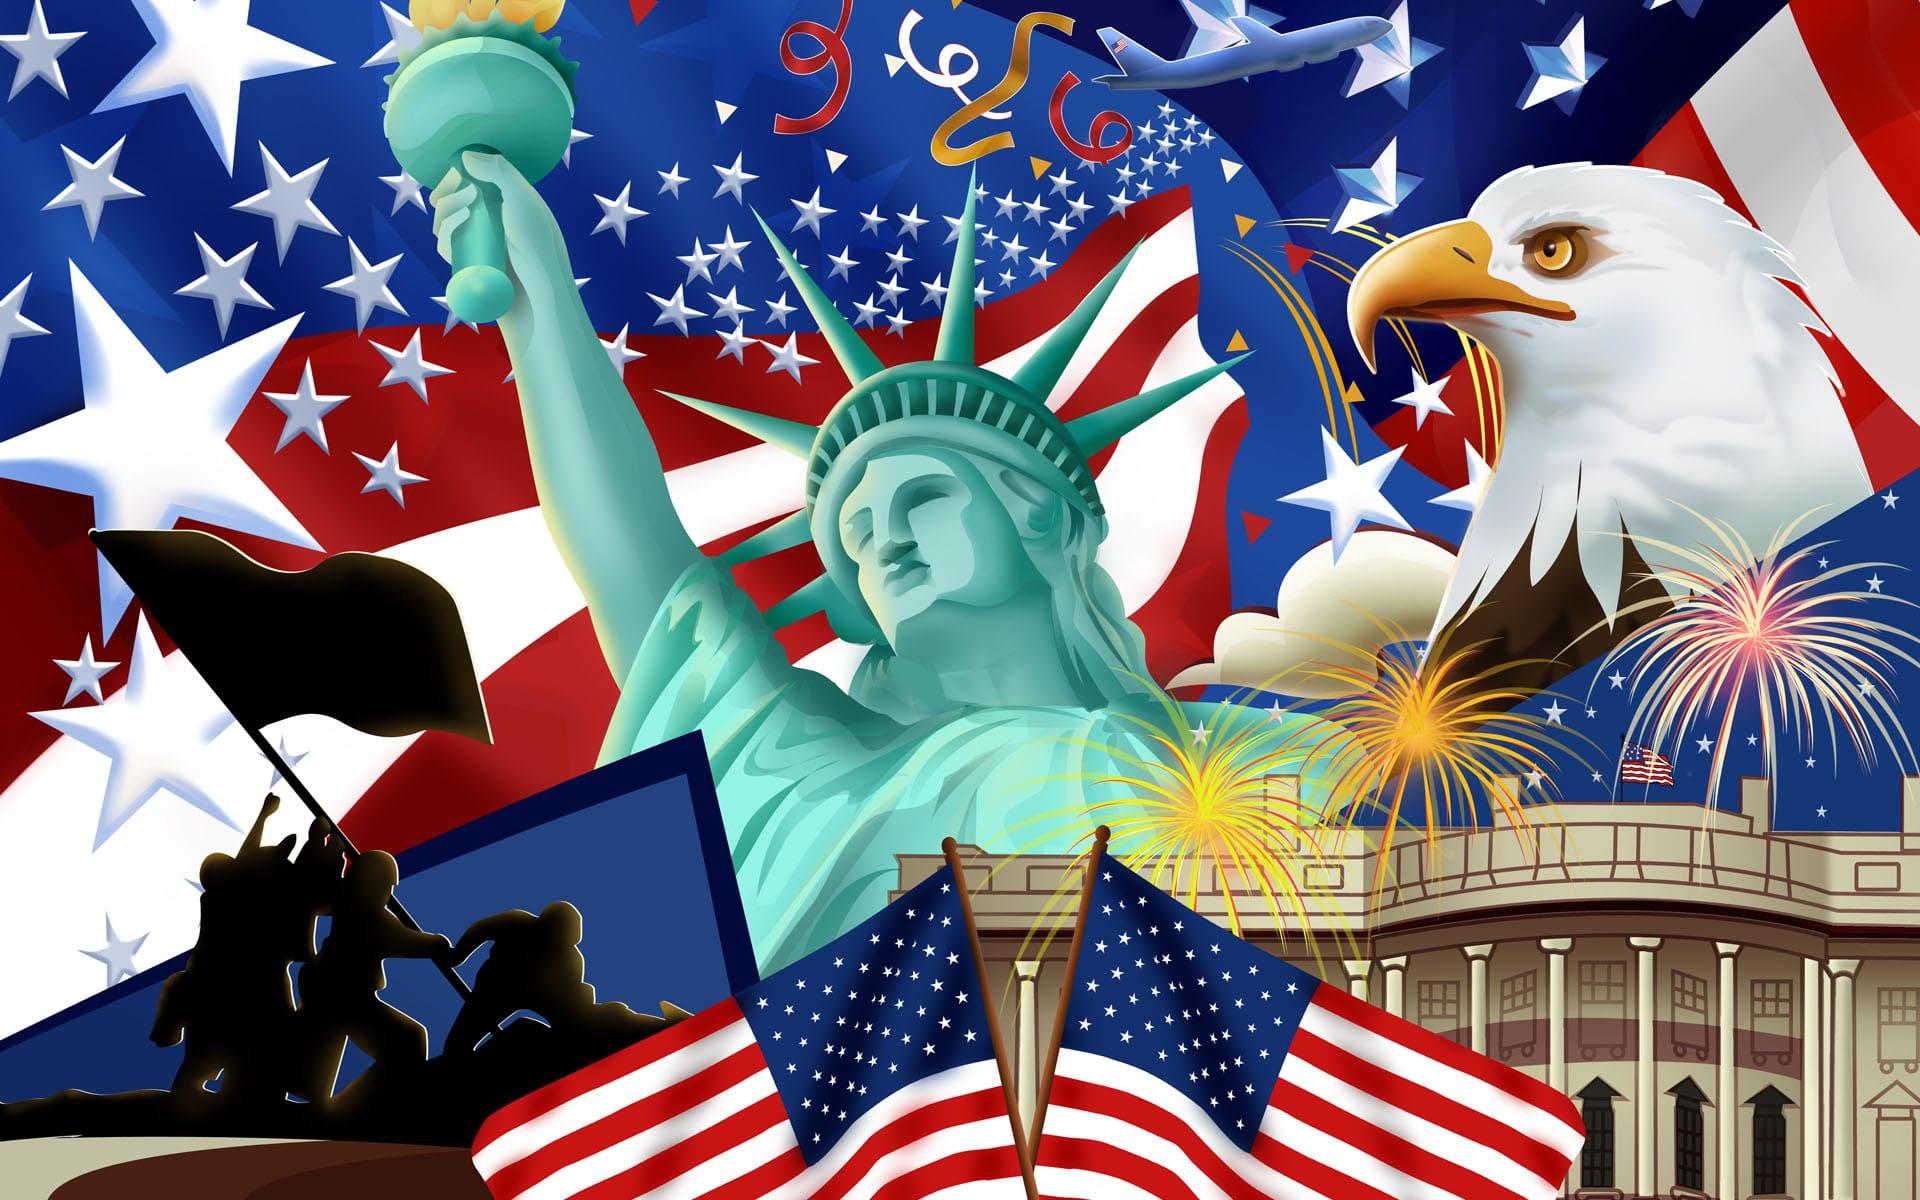 American symbols.